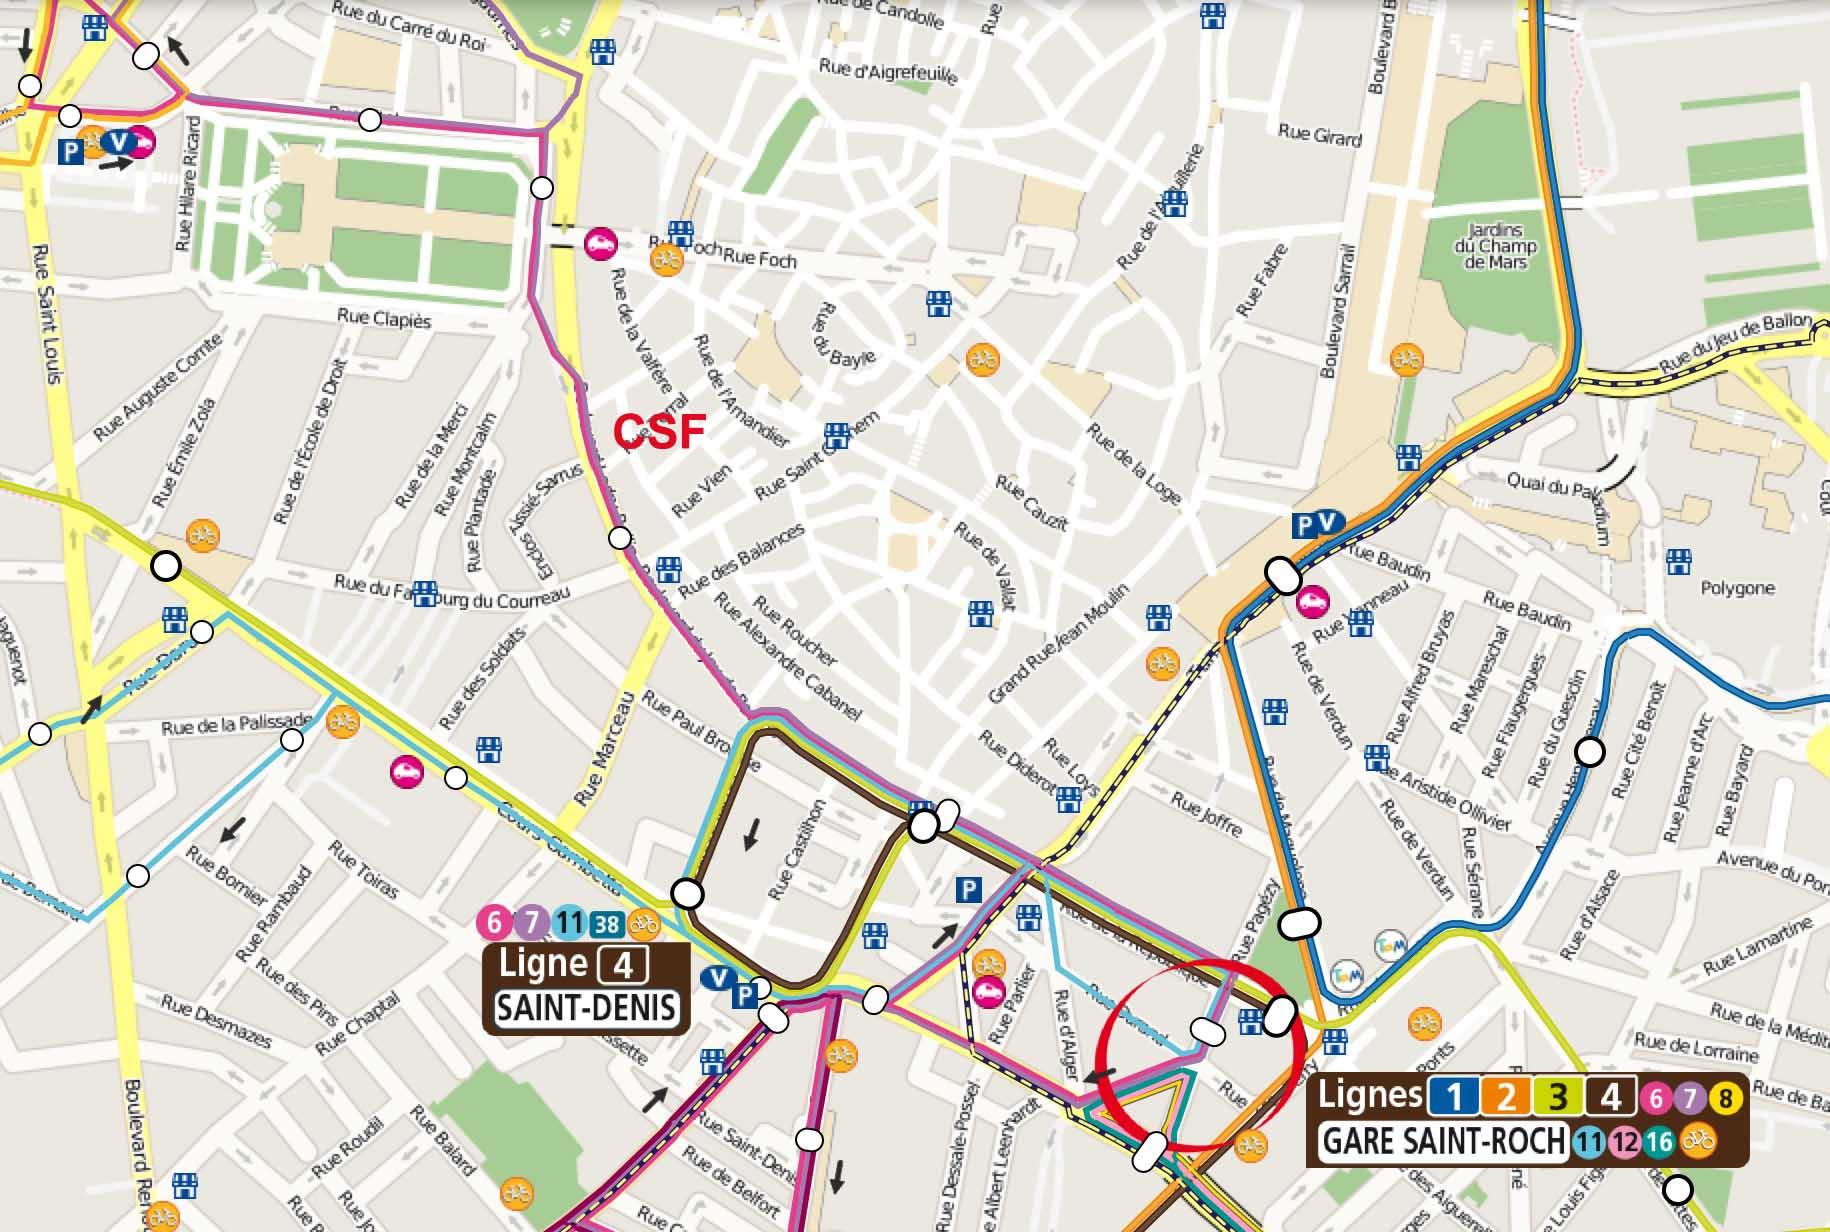 Plan d'accès à CSF en Tram